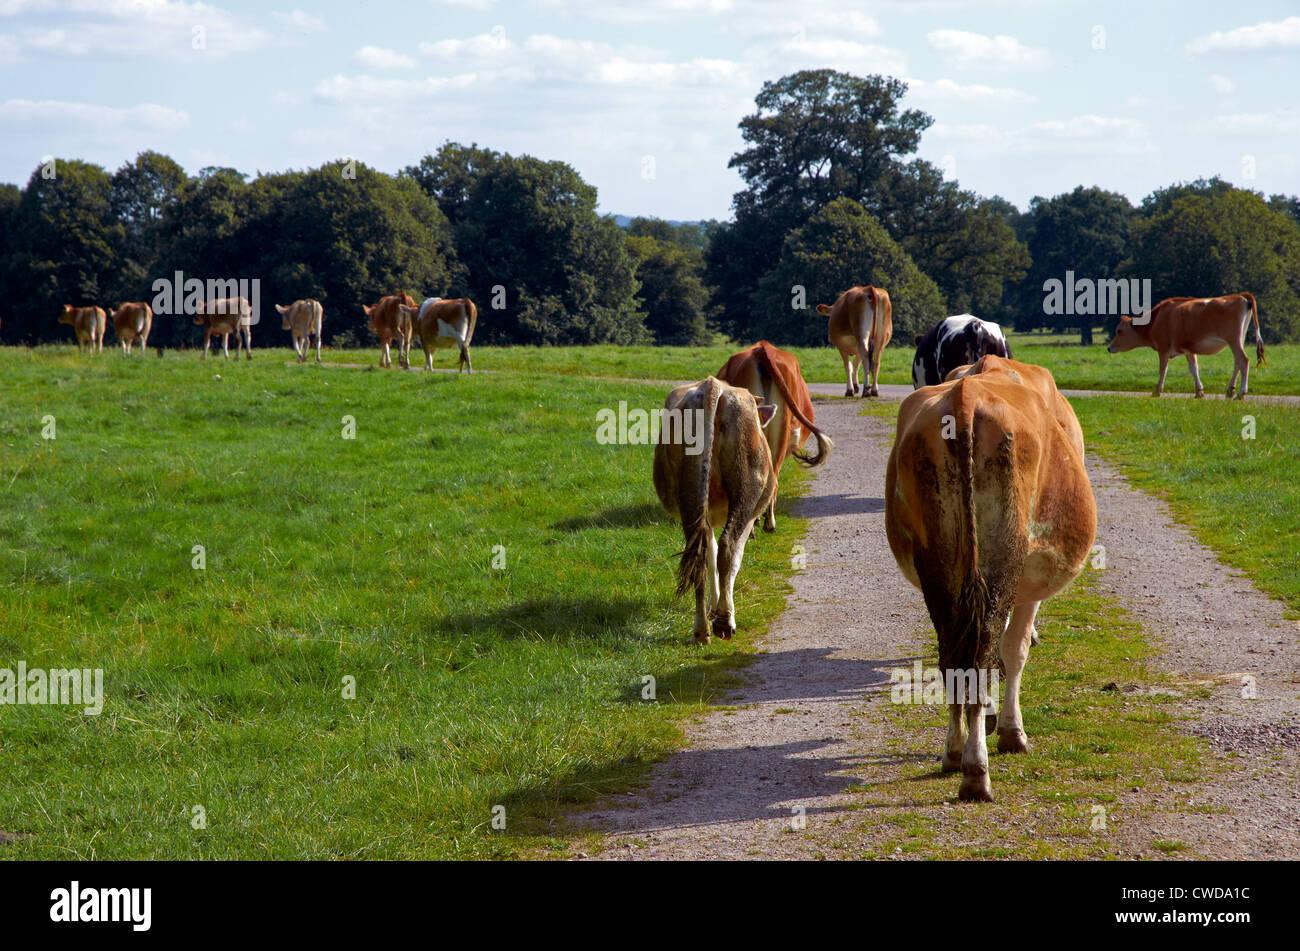 cows backside stock photos u0026 cows backside stock images alamy